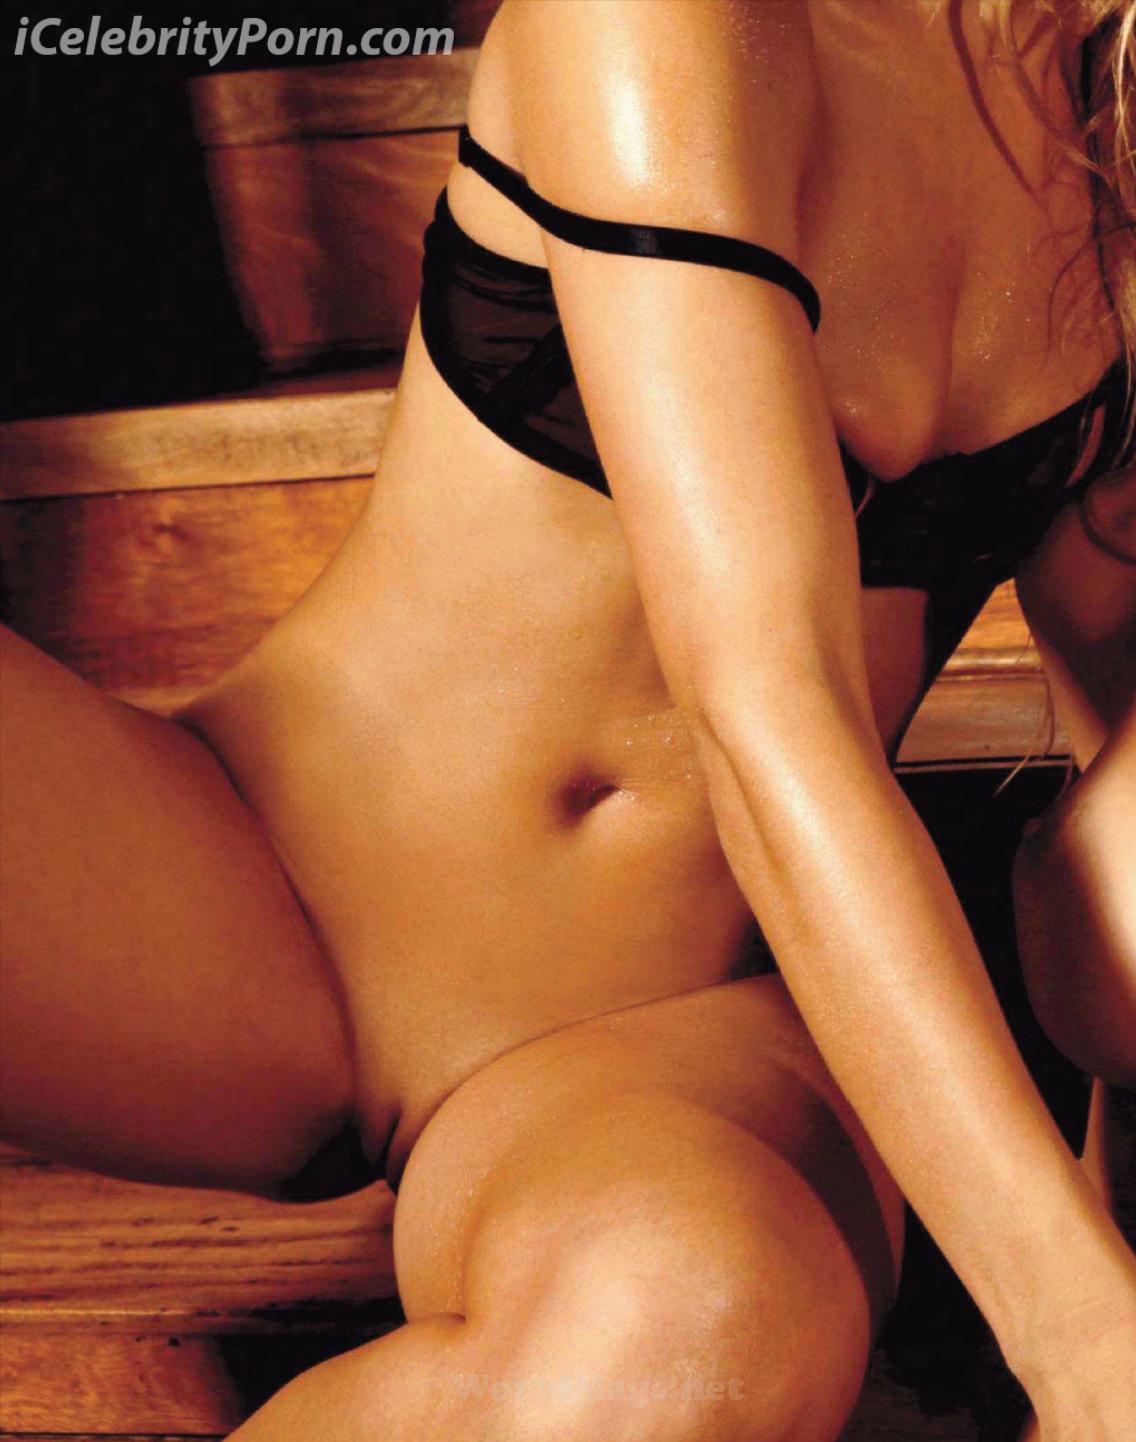 Yamila Piñeiro y Paula Avila Desnudas xxx Porno follando secion de fotos sexy puta lesbiana perra desnuda cachando video xxx (11)